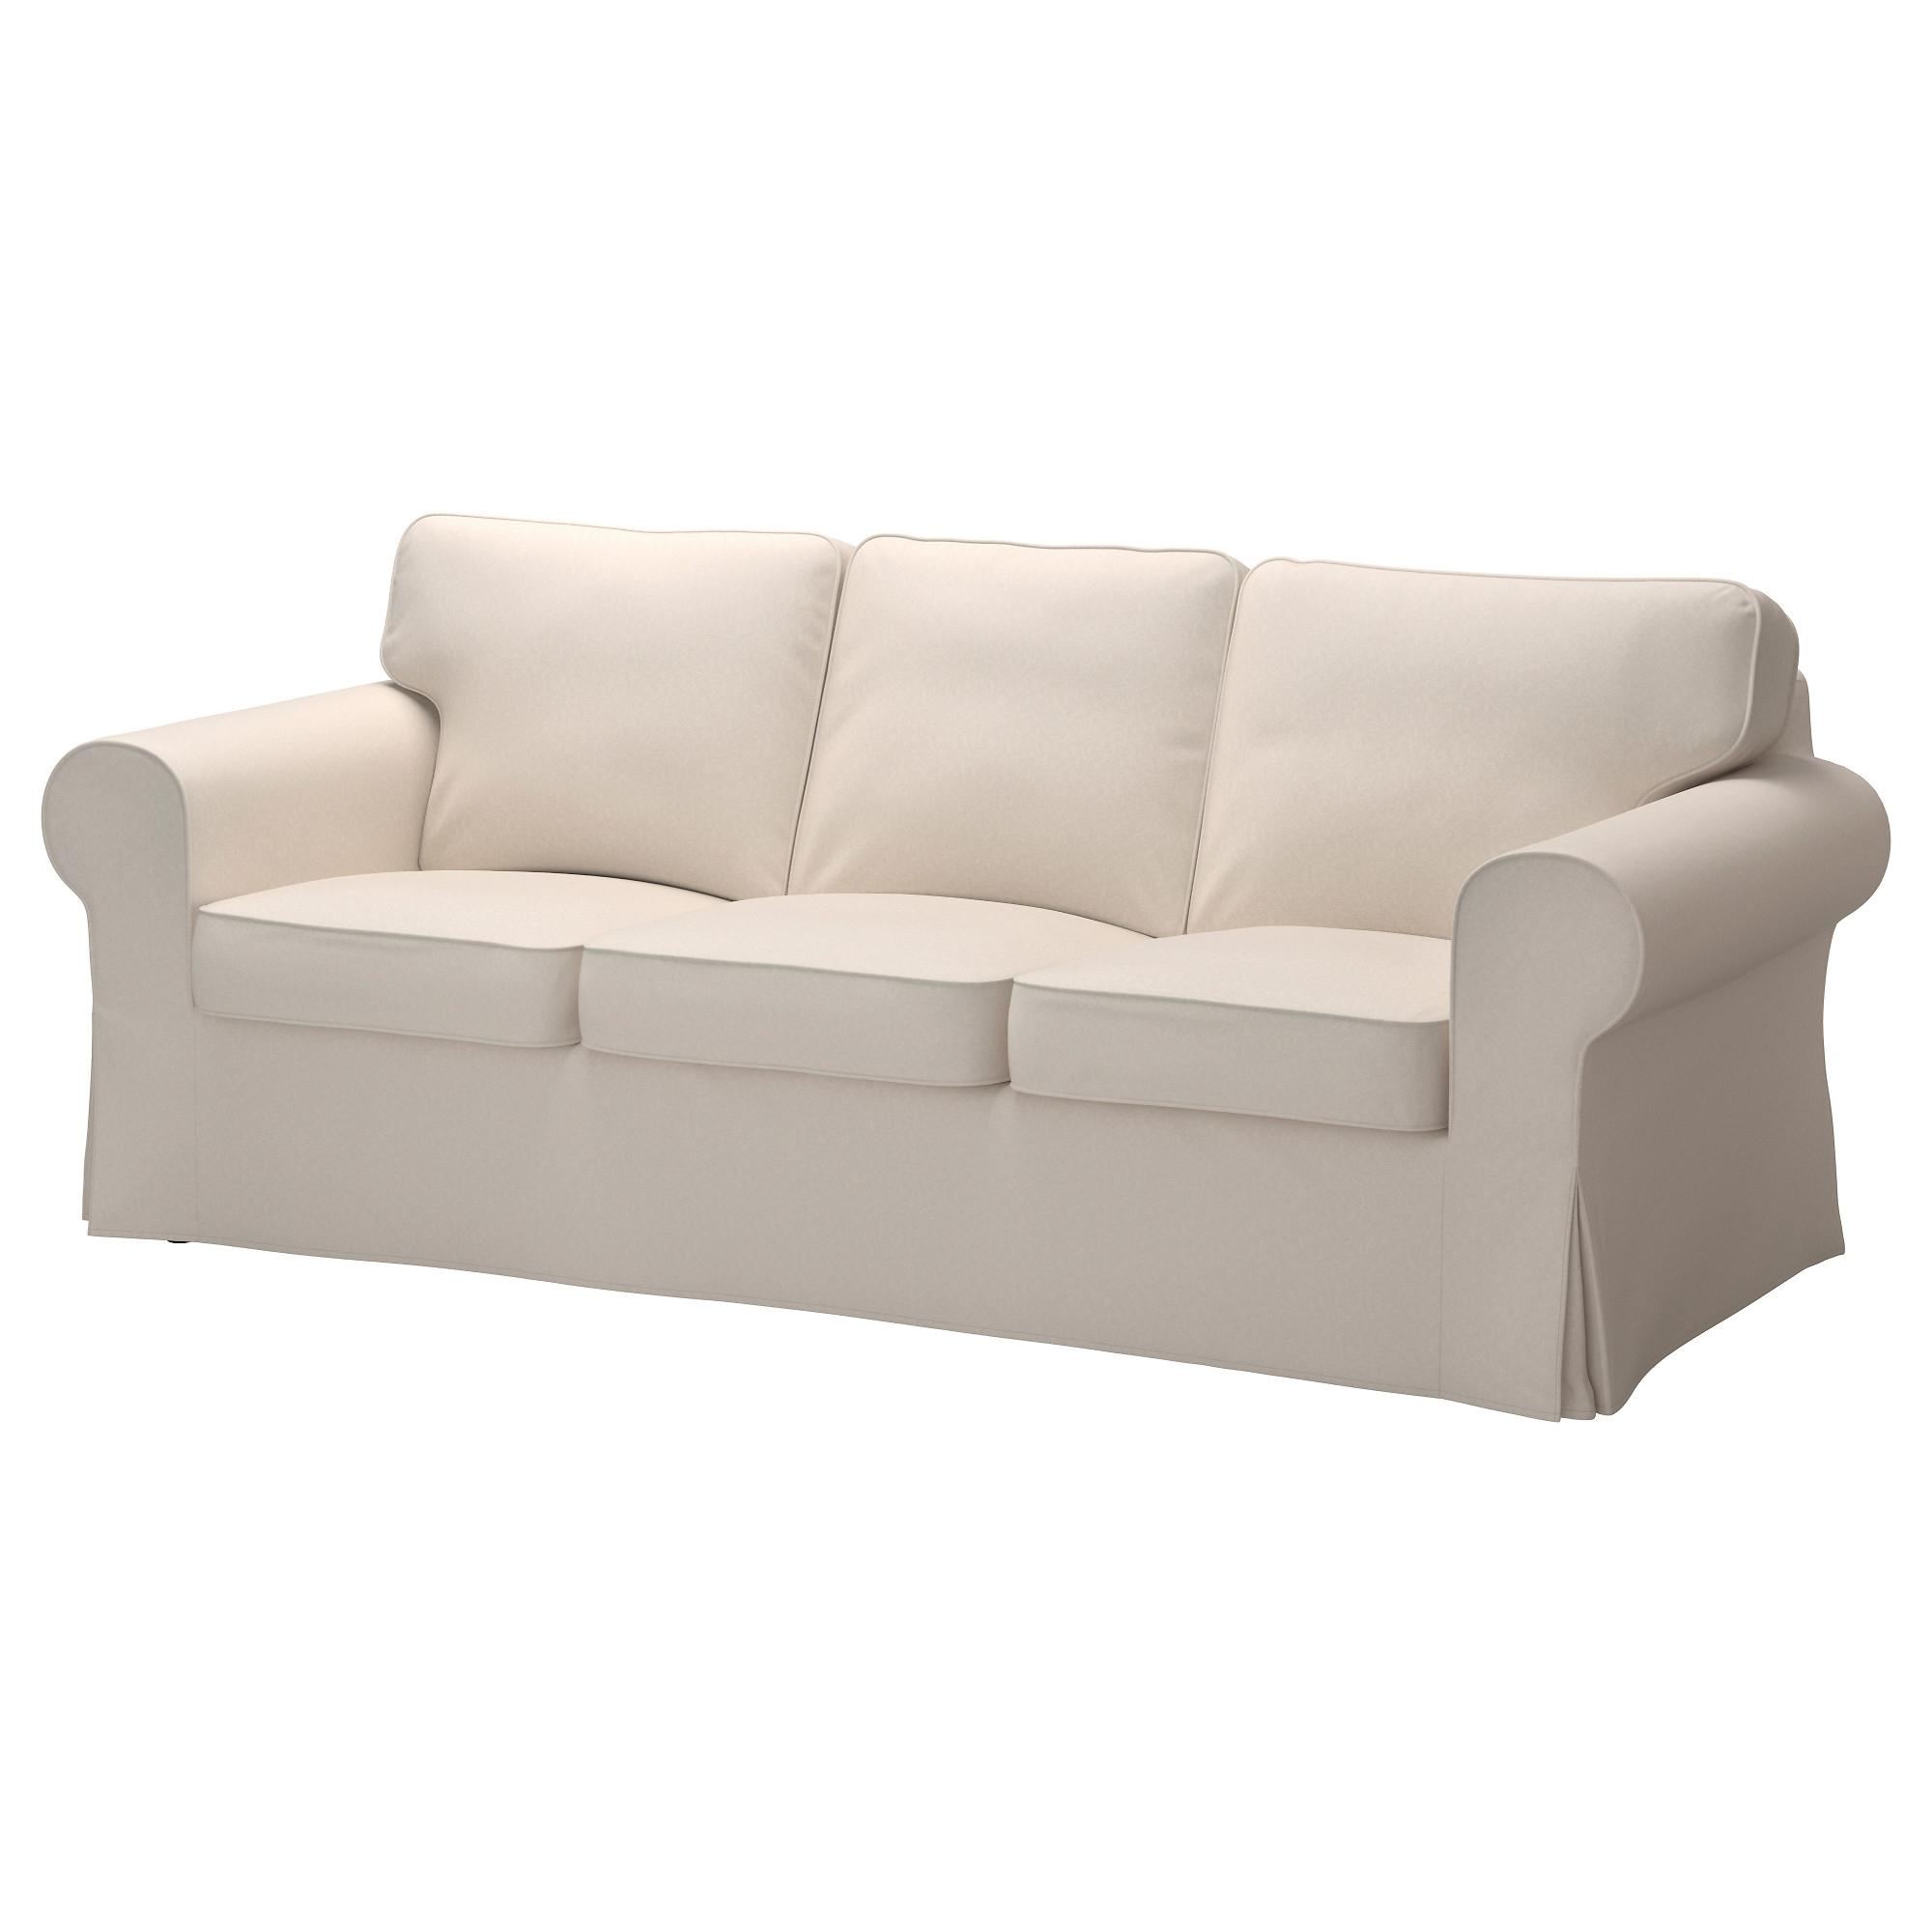 Ektorp Sofa Lofallet Beige Ikea For Sofa Chairs Ikea (View 3 of 15)